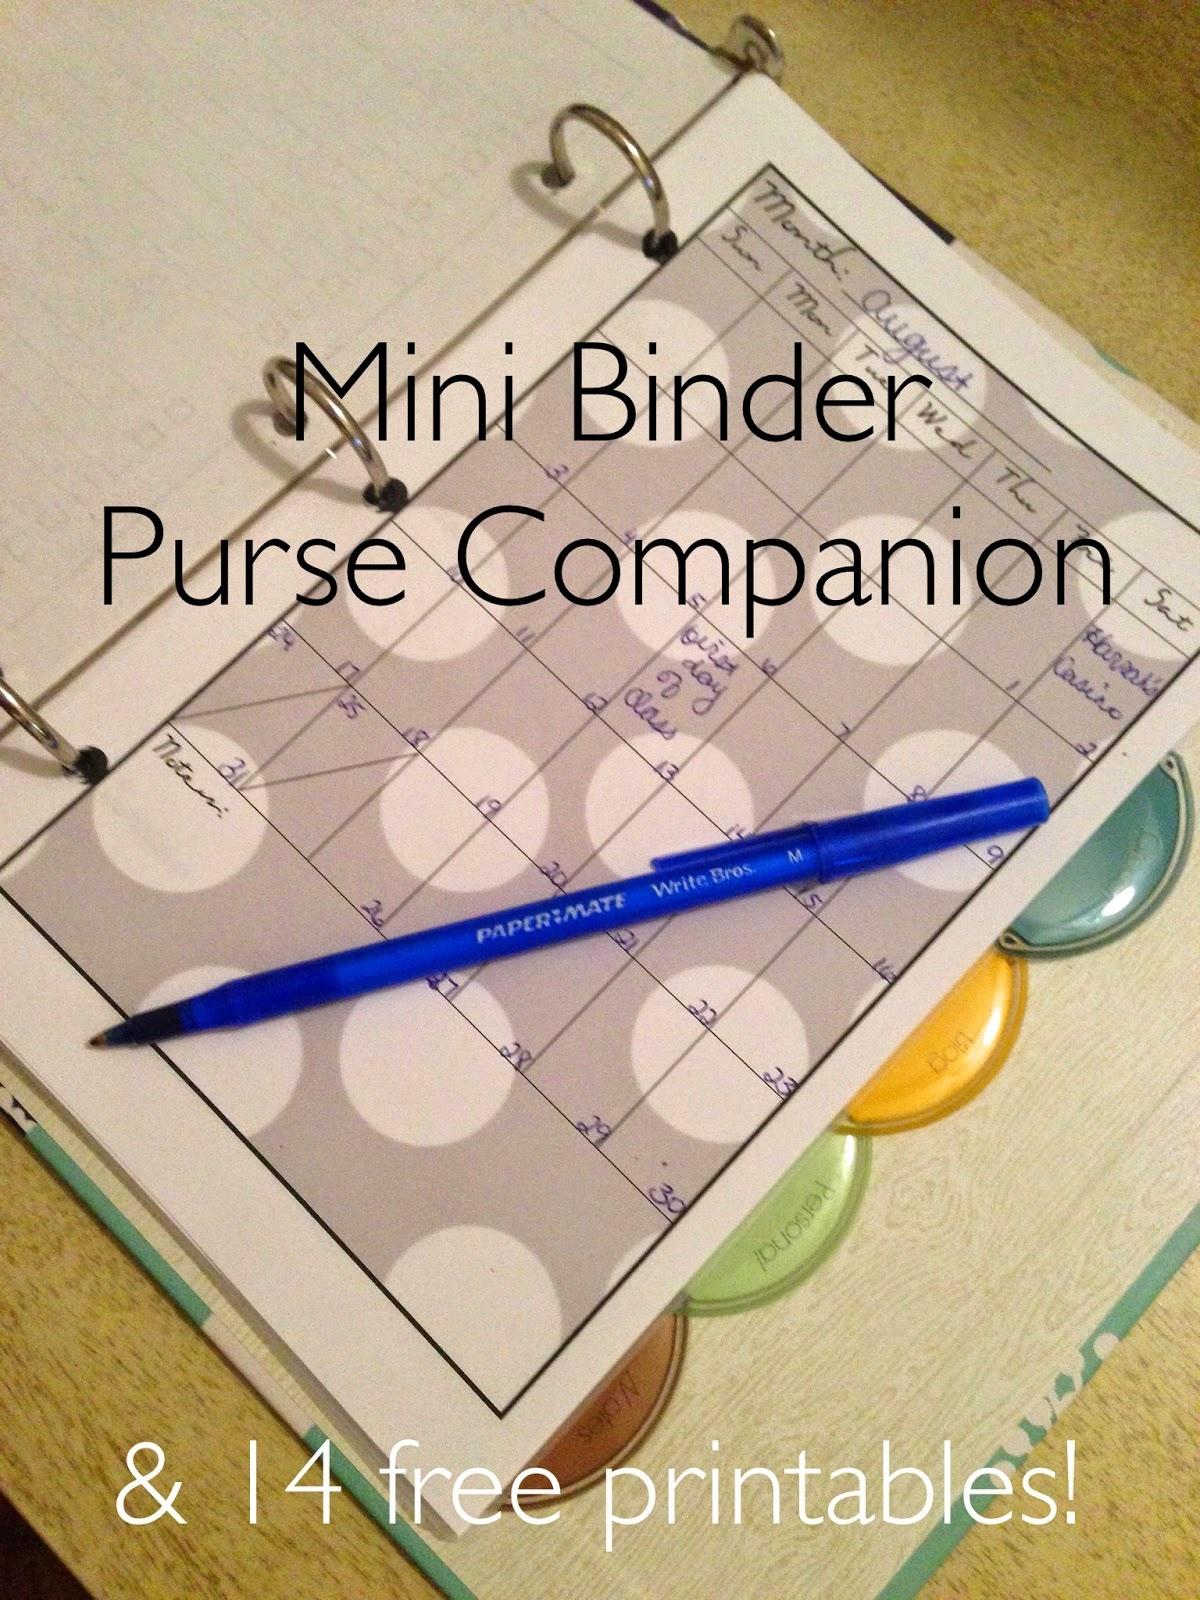 Easy As Diy: Diy: Mini Binder Purse Companion & 14 Free Printables! - Mini Binder Free Printables